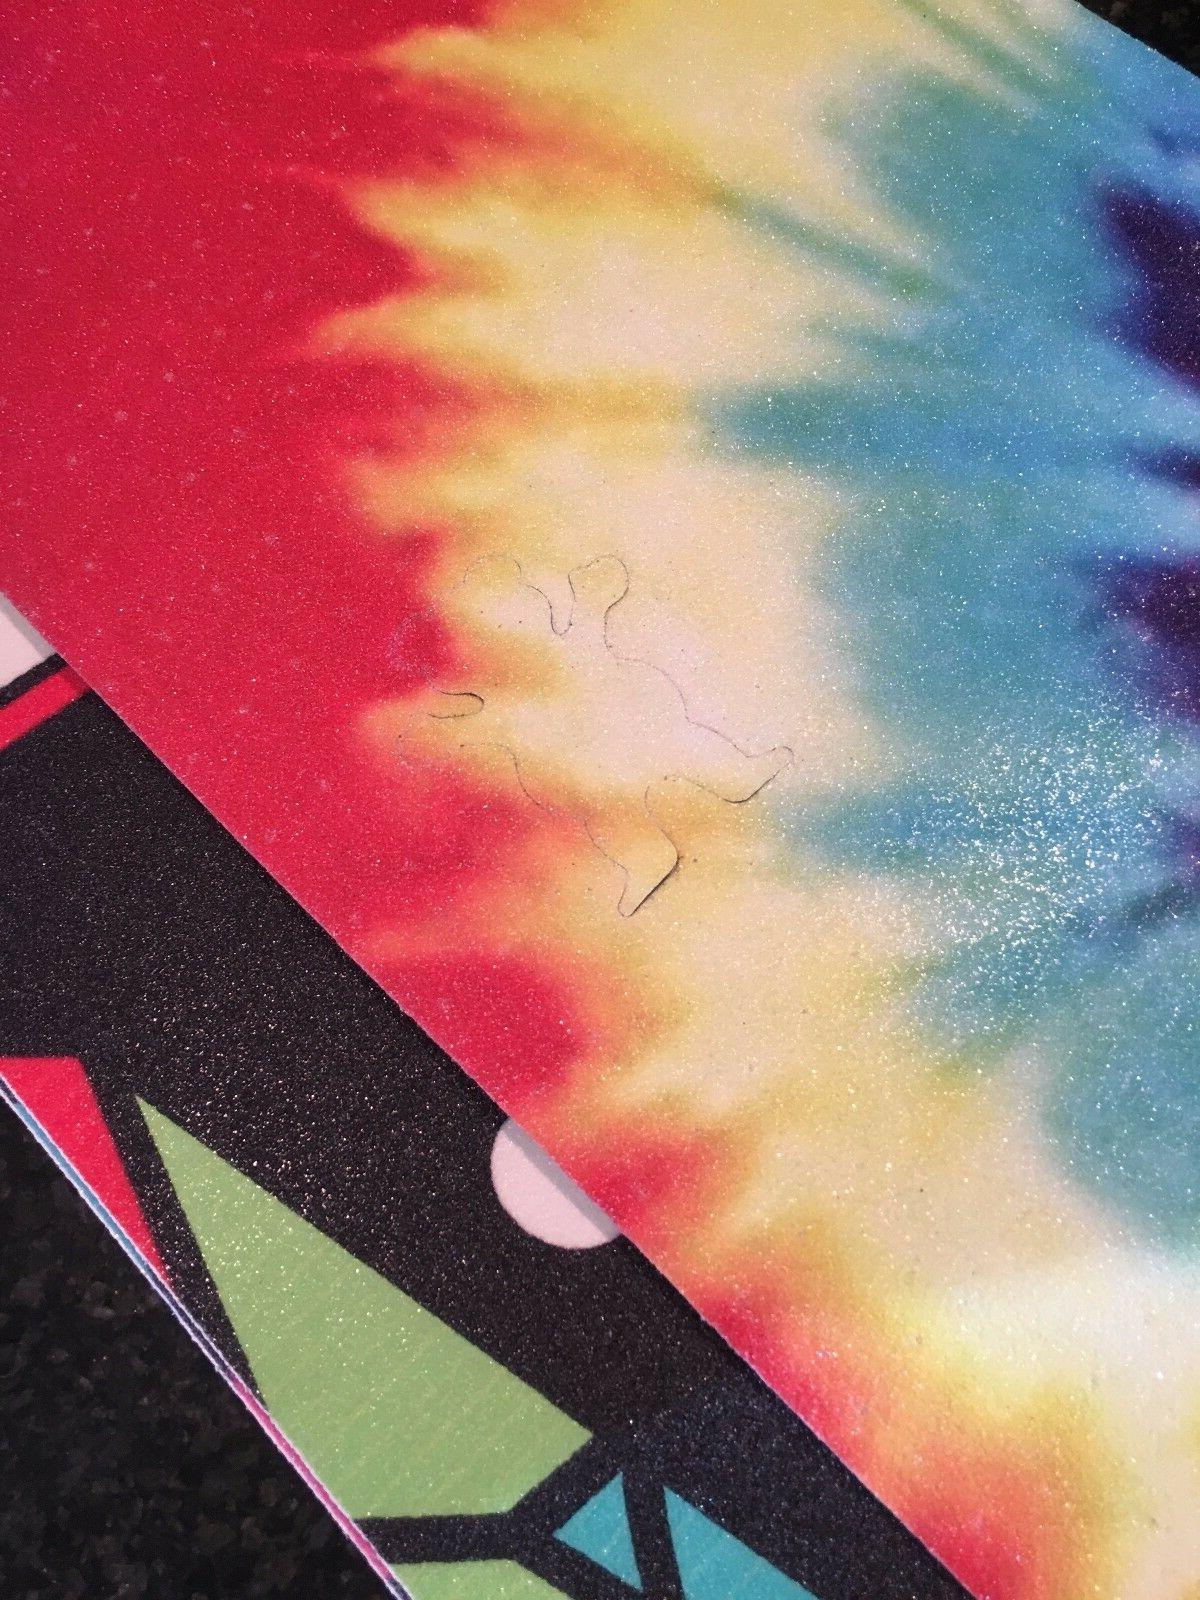 Tie Dye Grip Tape - Cutout 85cm